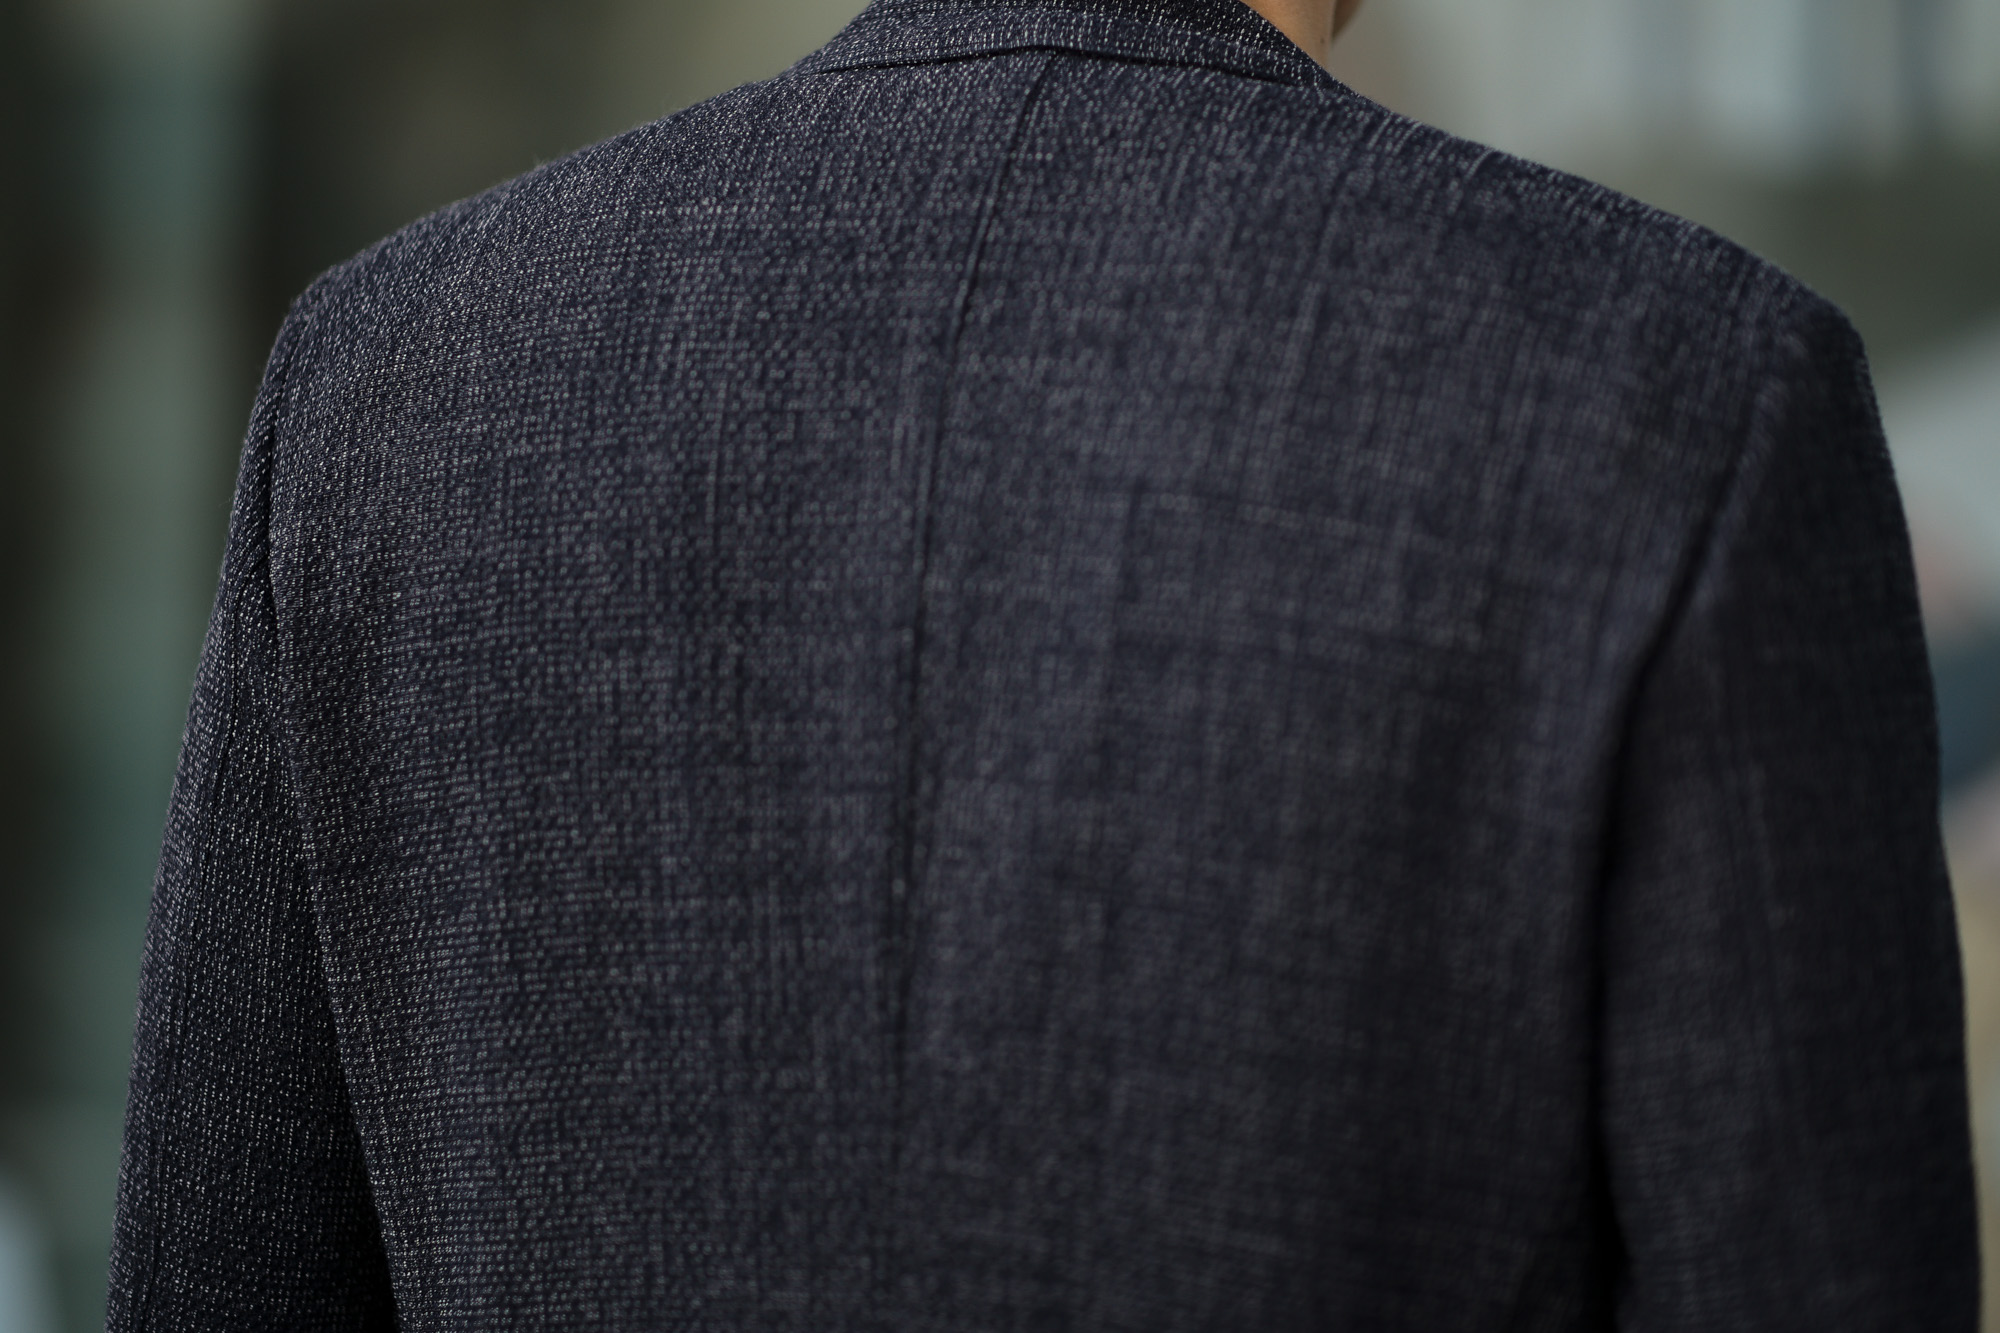 BELVEST (ベルベスト) CAPSULE SINGLE BREASTE JACKET 2PATCH WOOL SLAB COMFORT ストレッチ サマーウールスラブ ジャケット NAVY (ネイビー) Made in italy (イタリア製) 2020 春夏新作 愛知 名古屋 altoediritto アルトエデリット